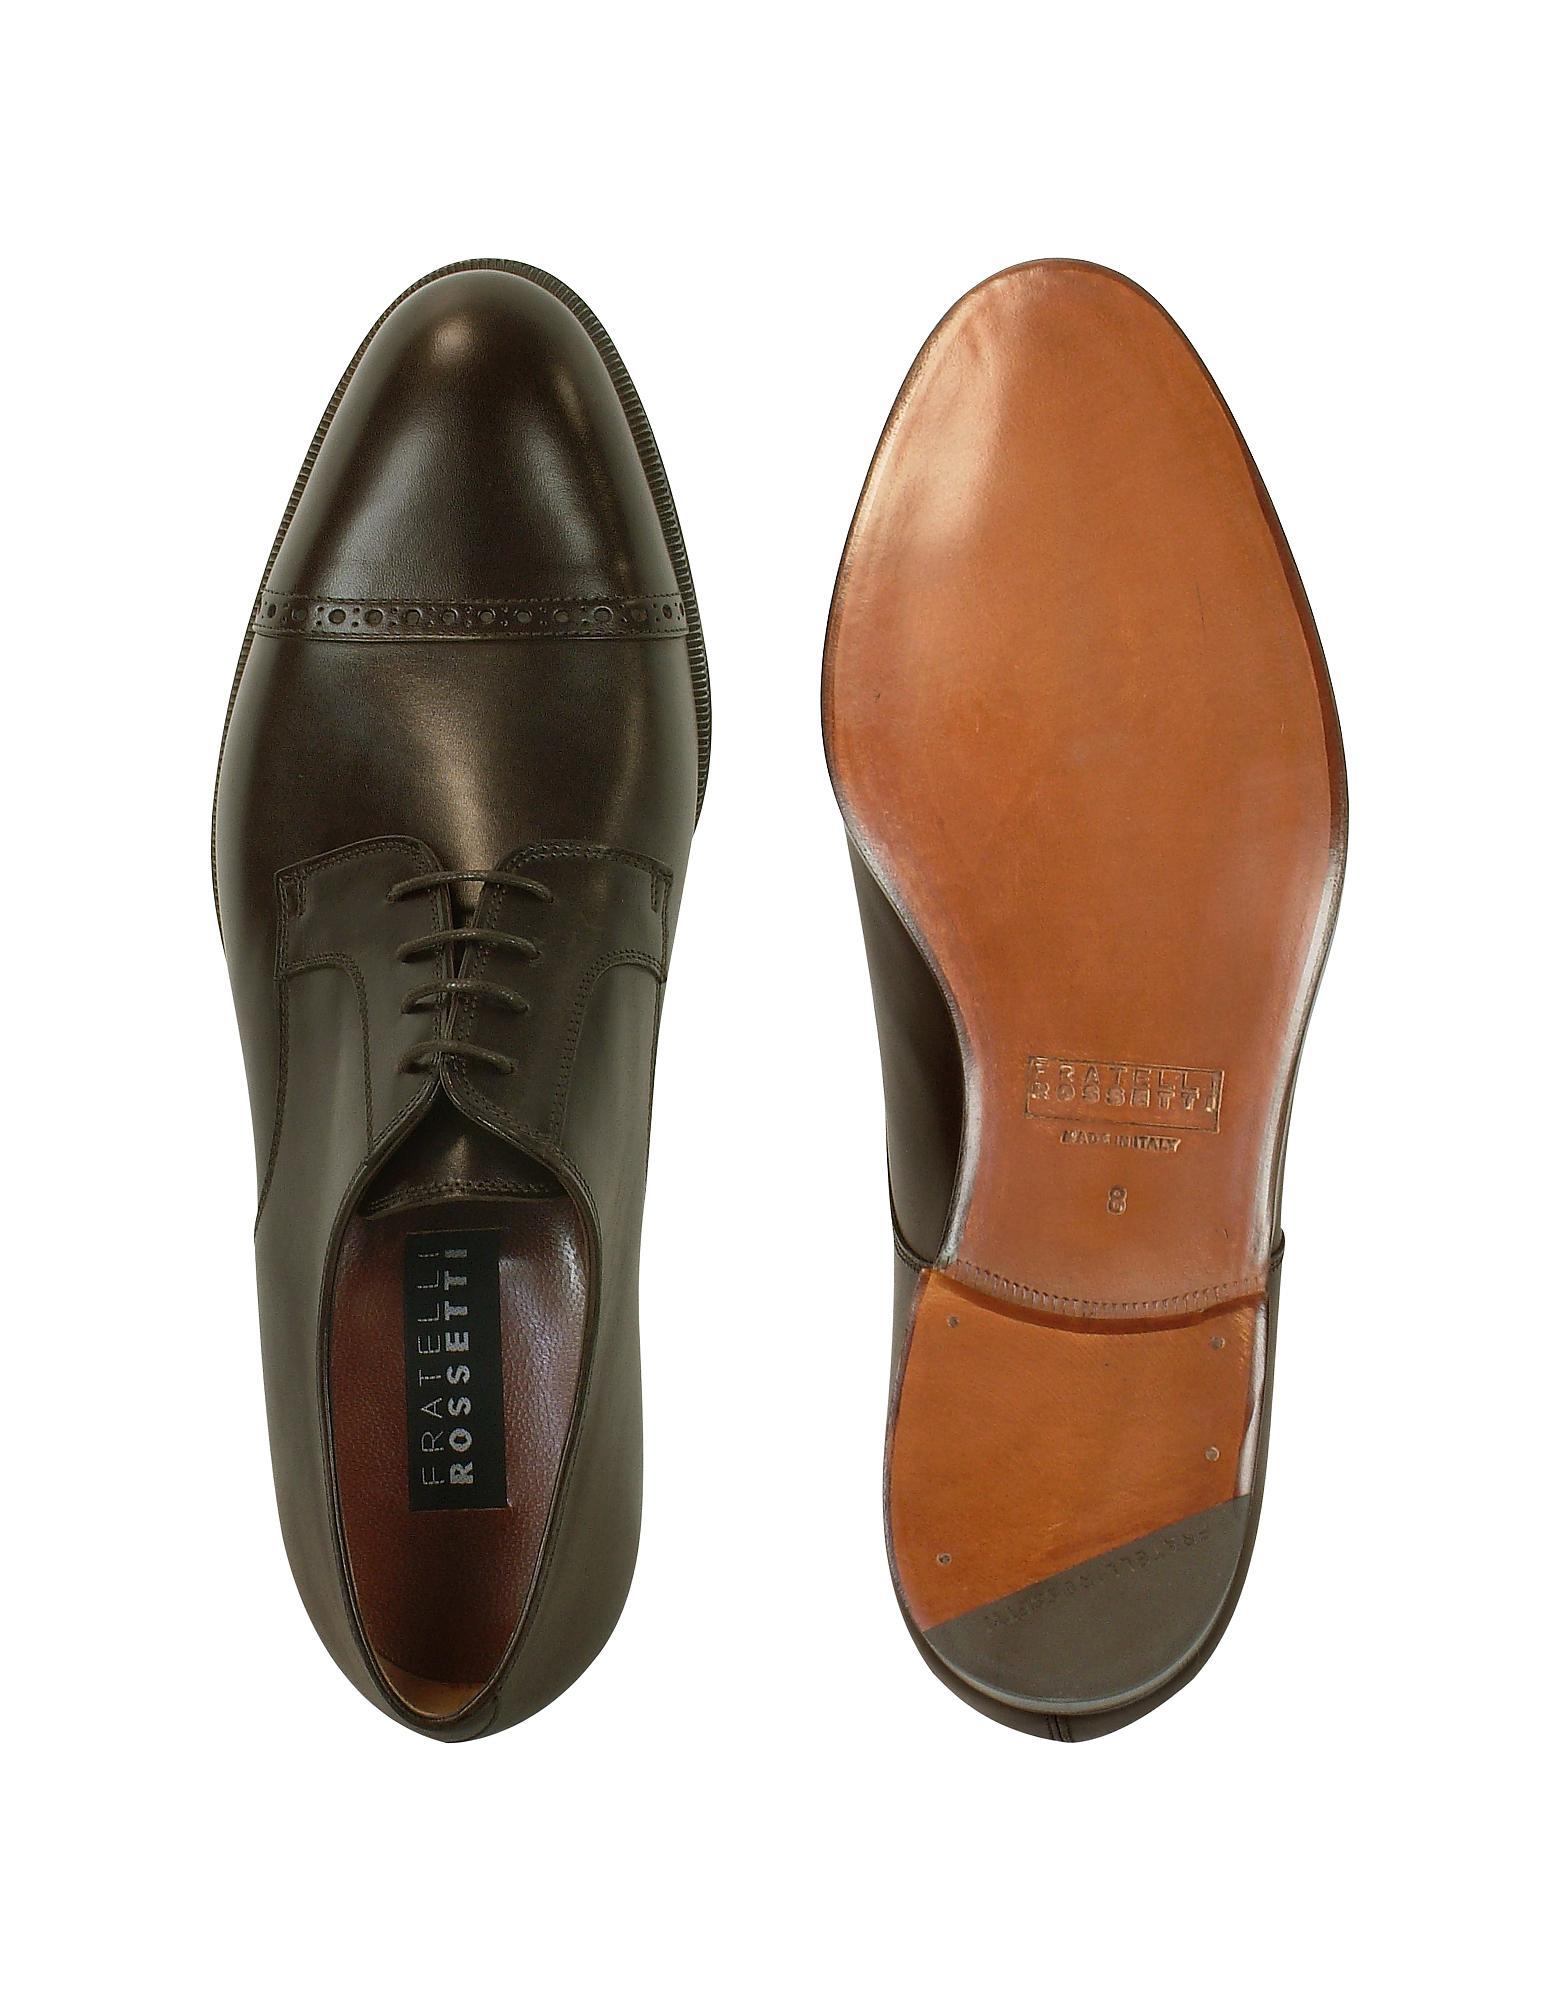 Fratelli Rossetti Shoes Uk